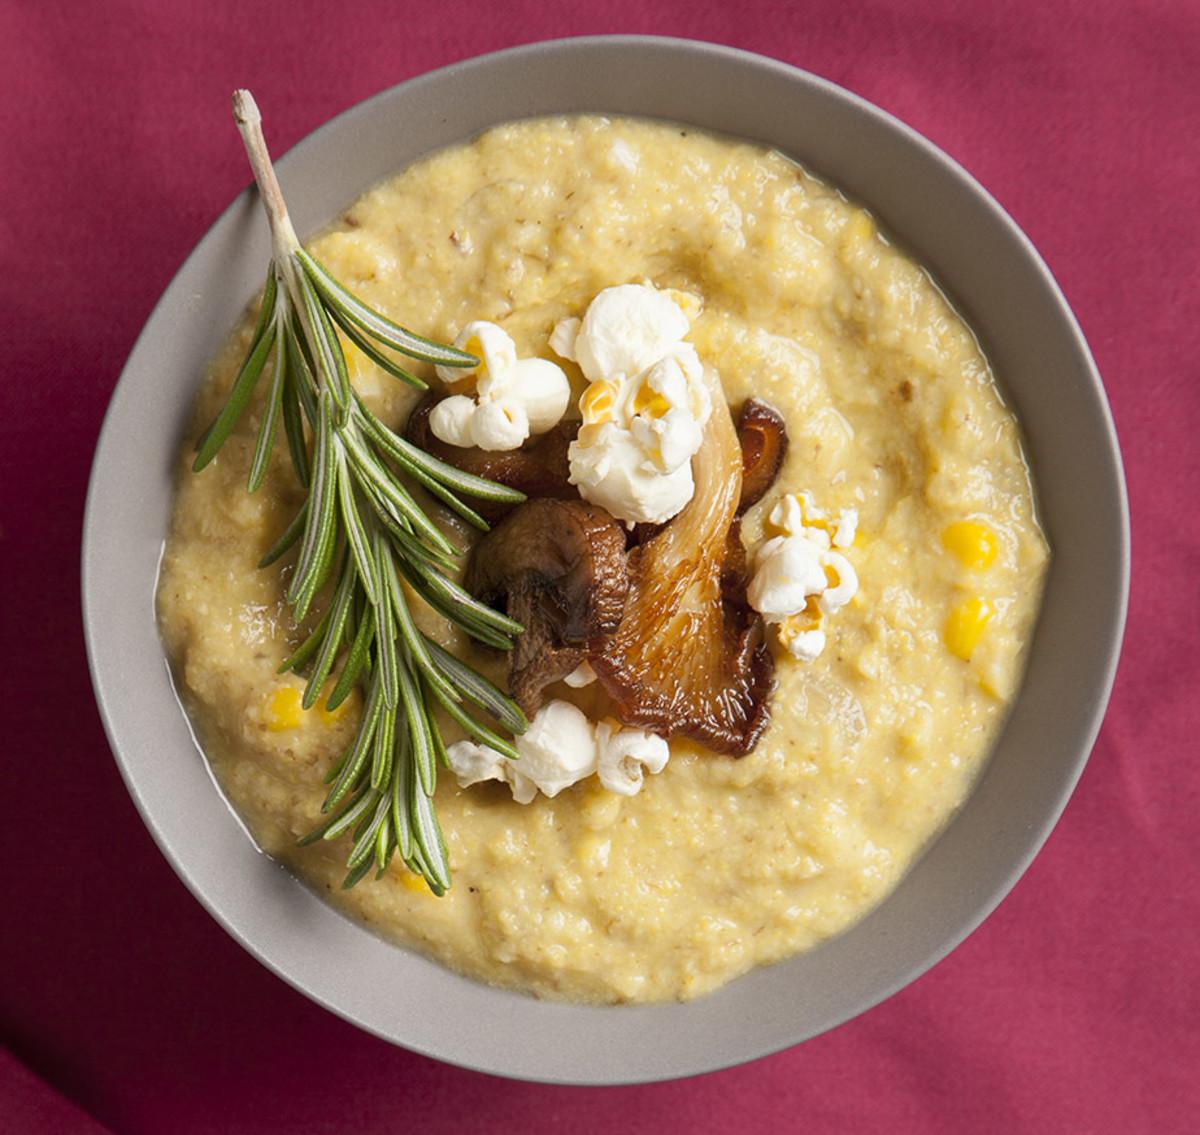 Chilled corn chowder